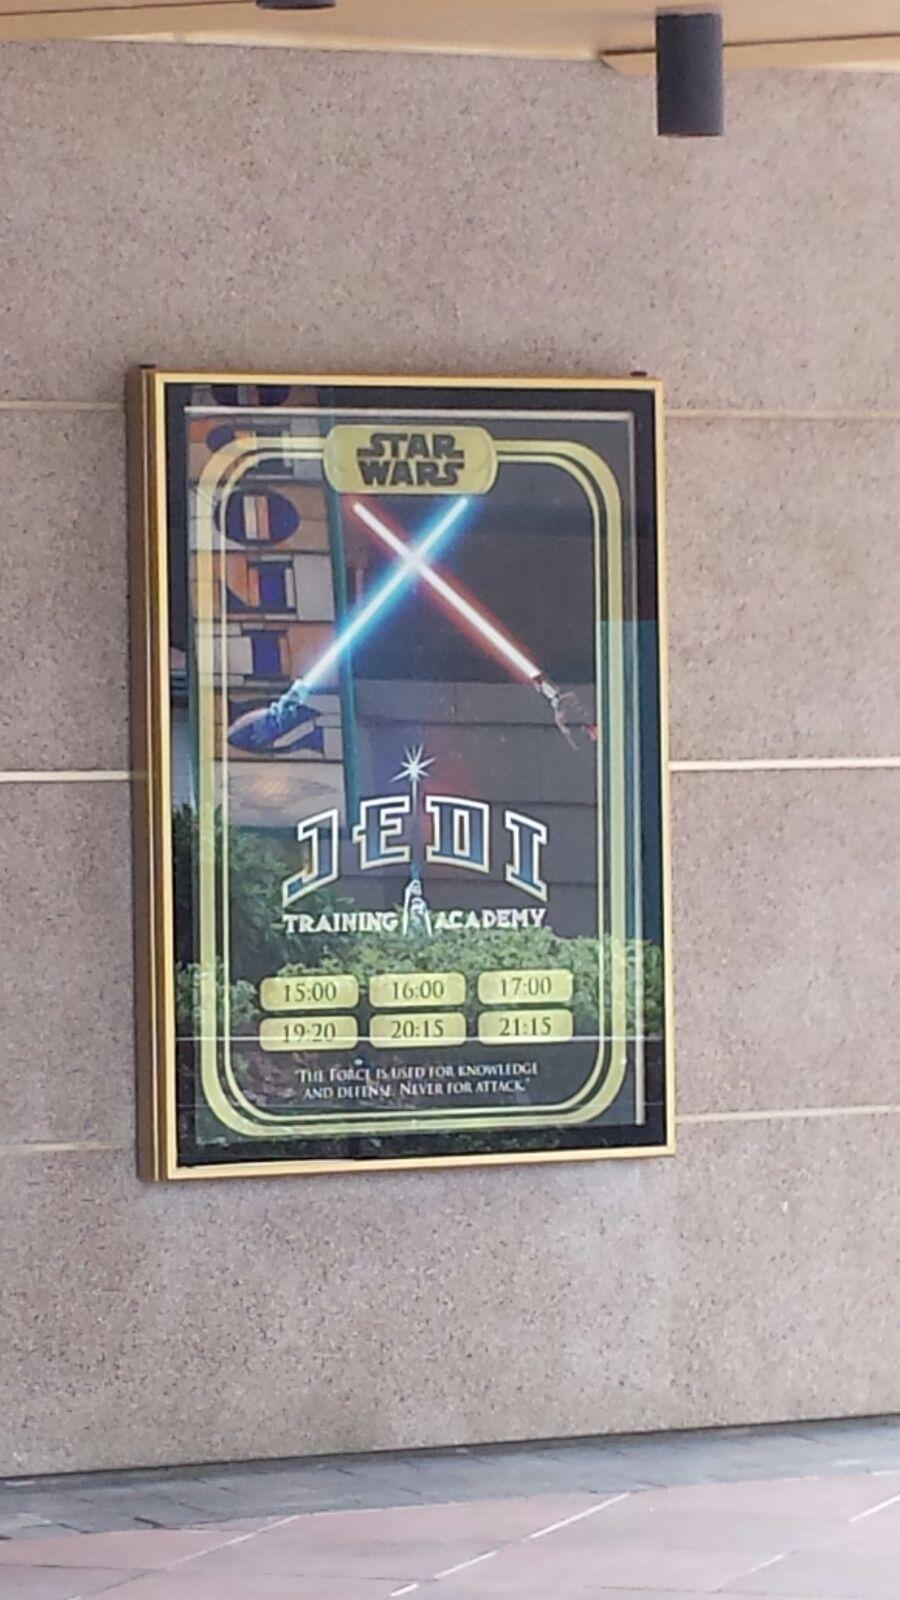 Jedi Training Academy - Pagina 6 Img-2025